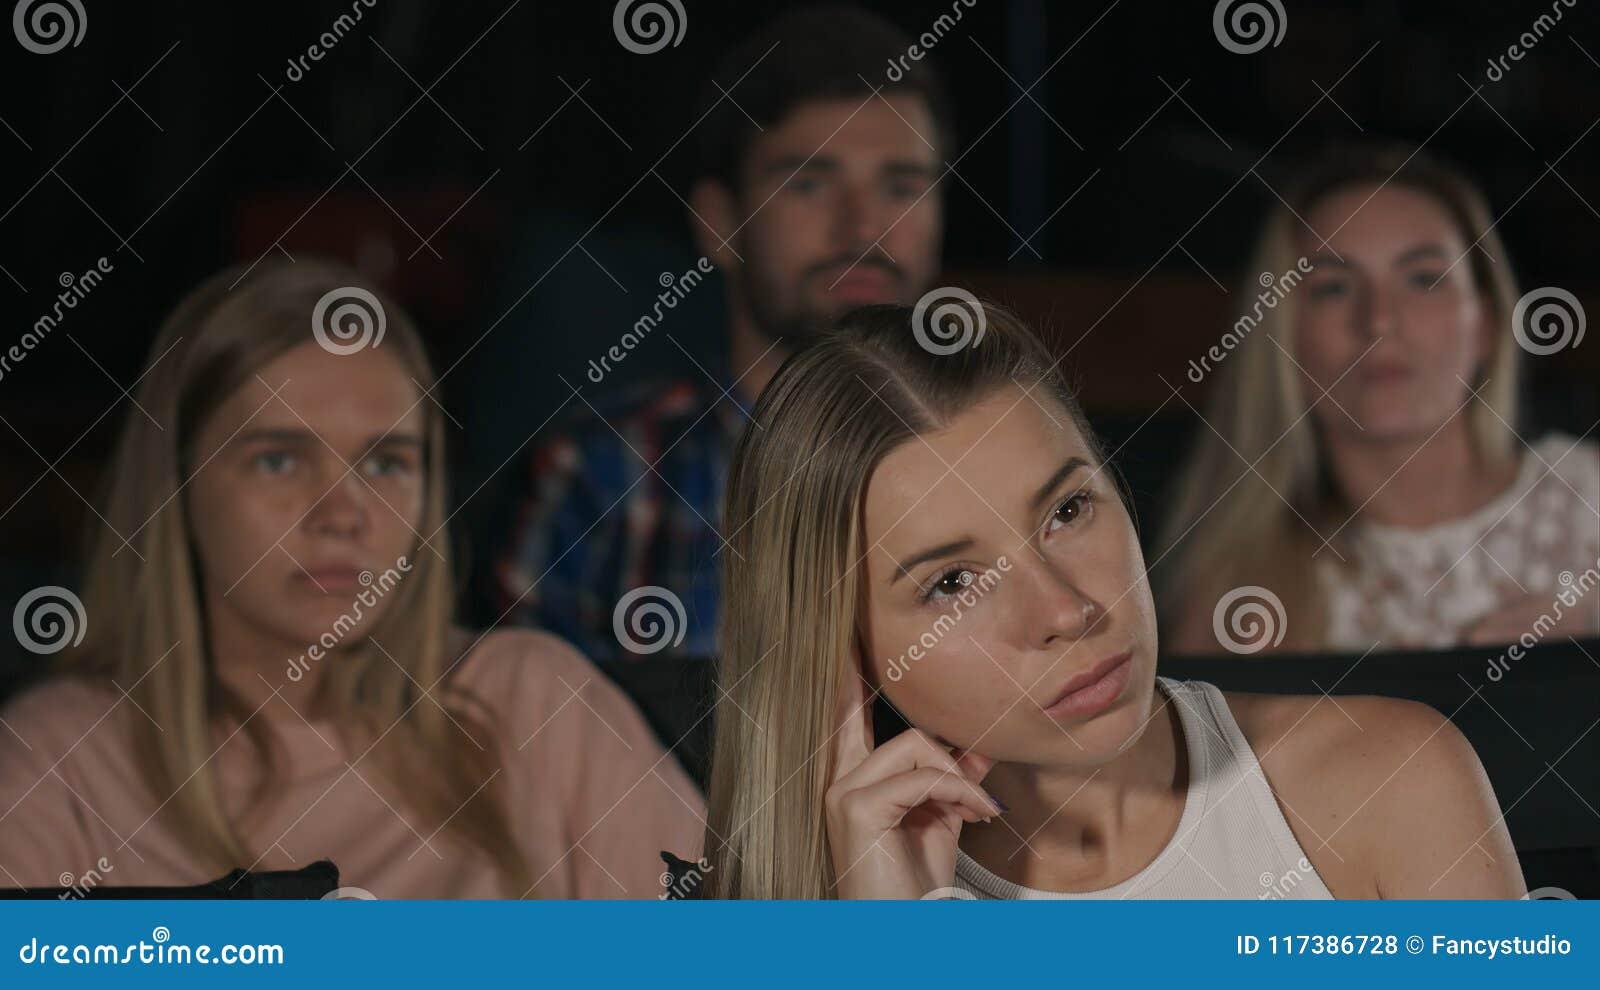 Holly valance sex scene